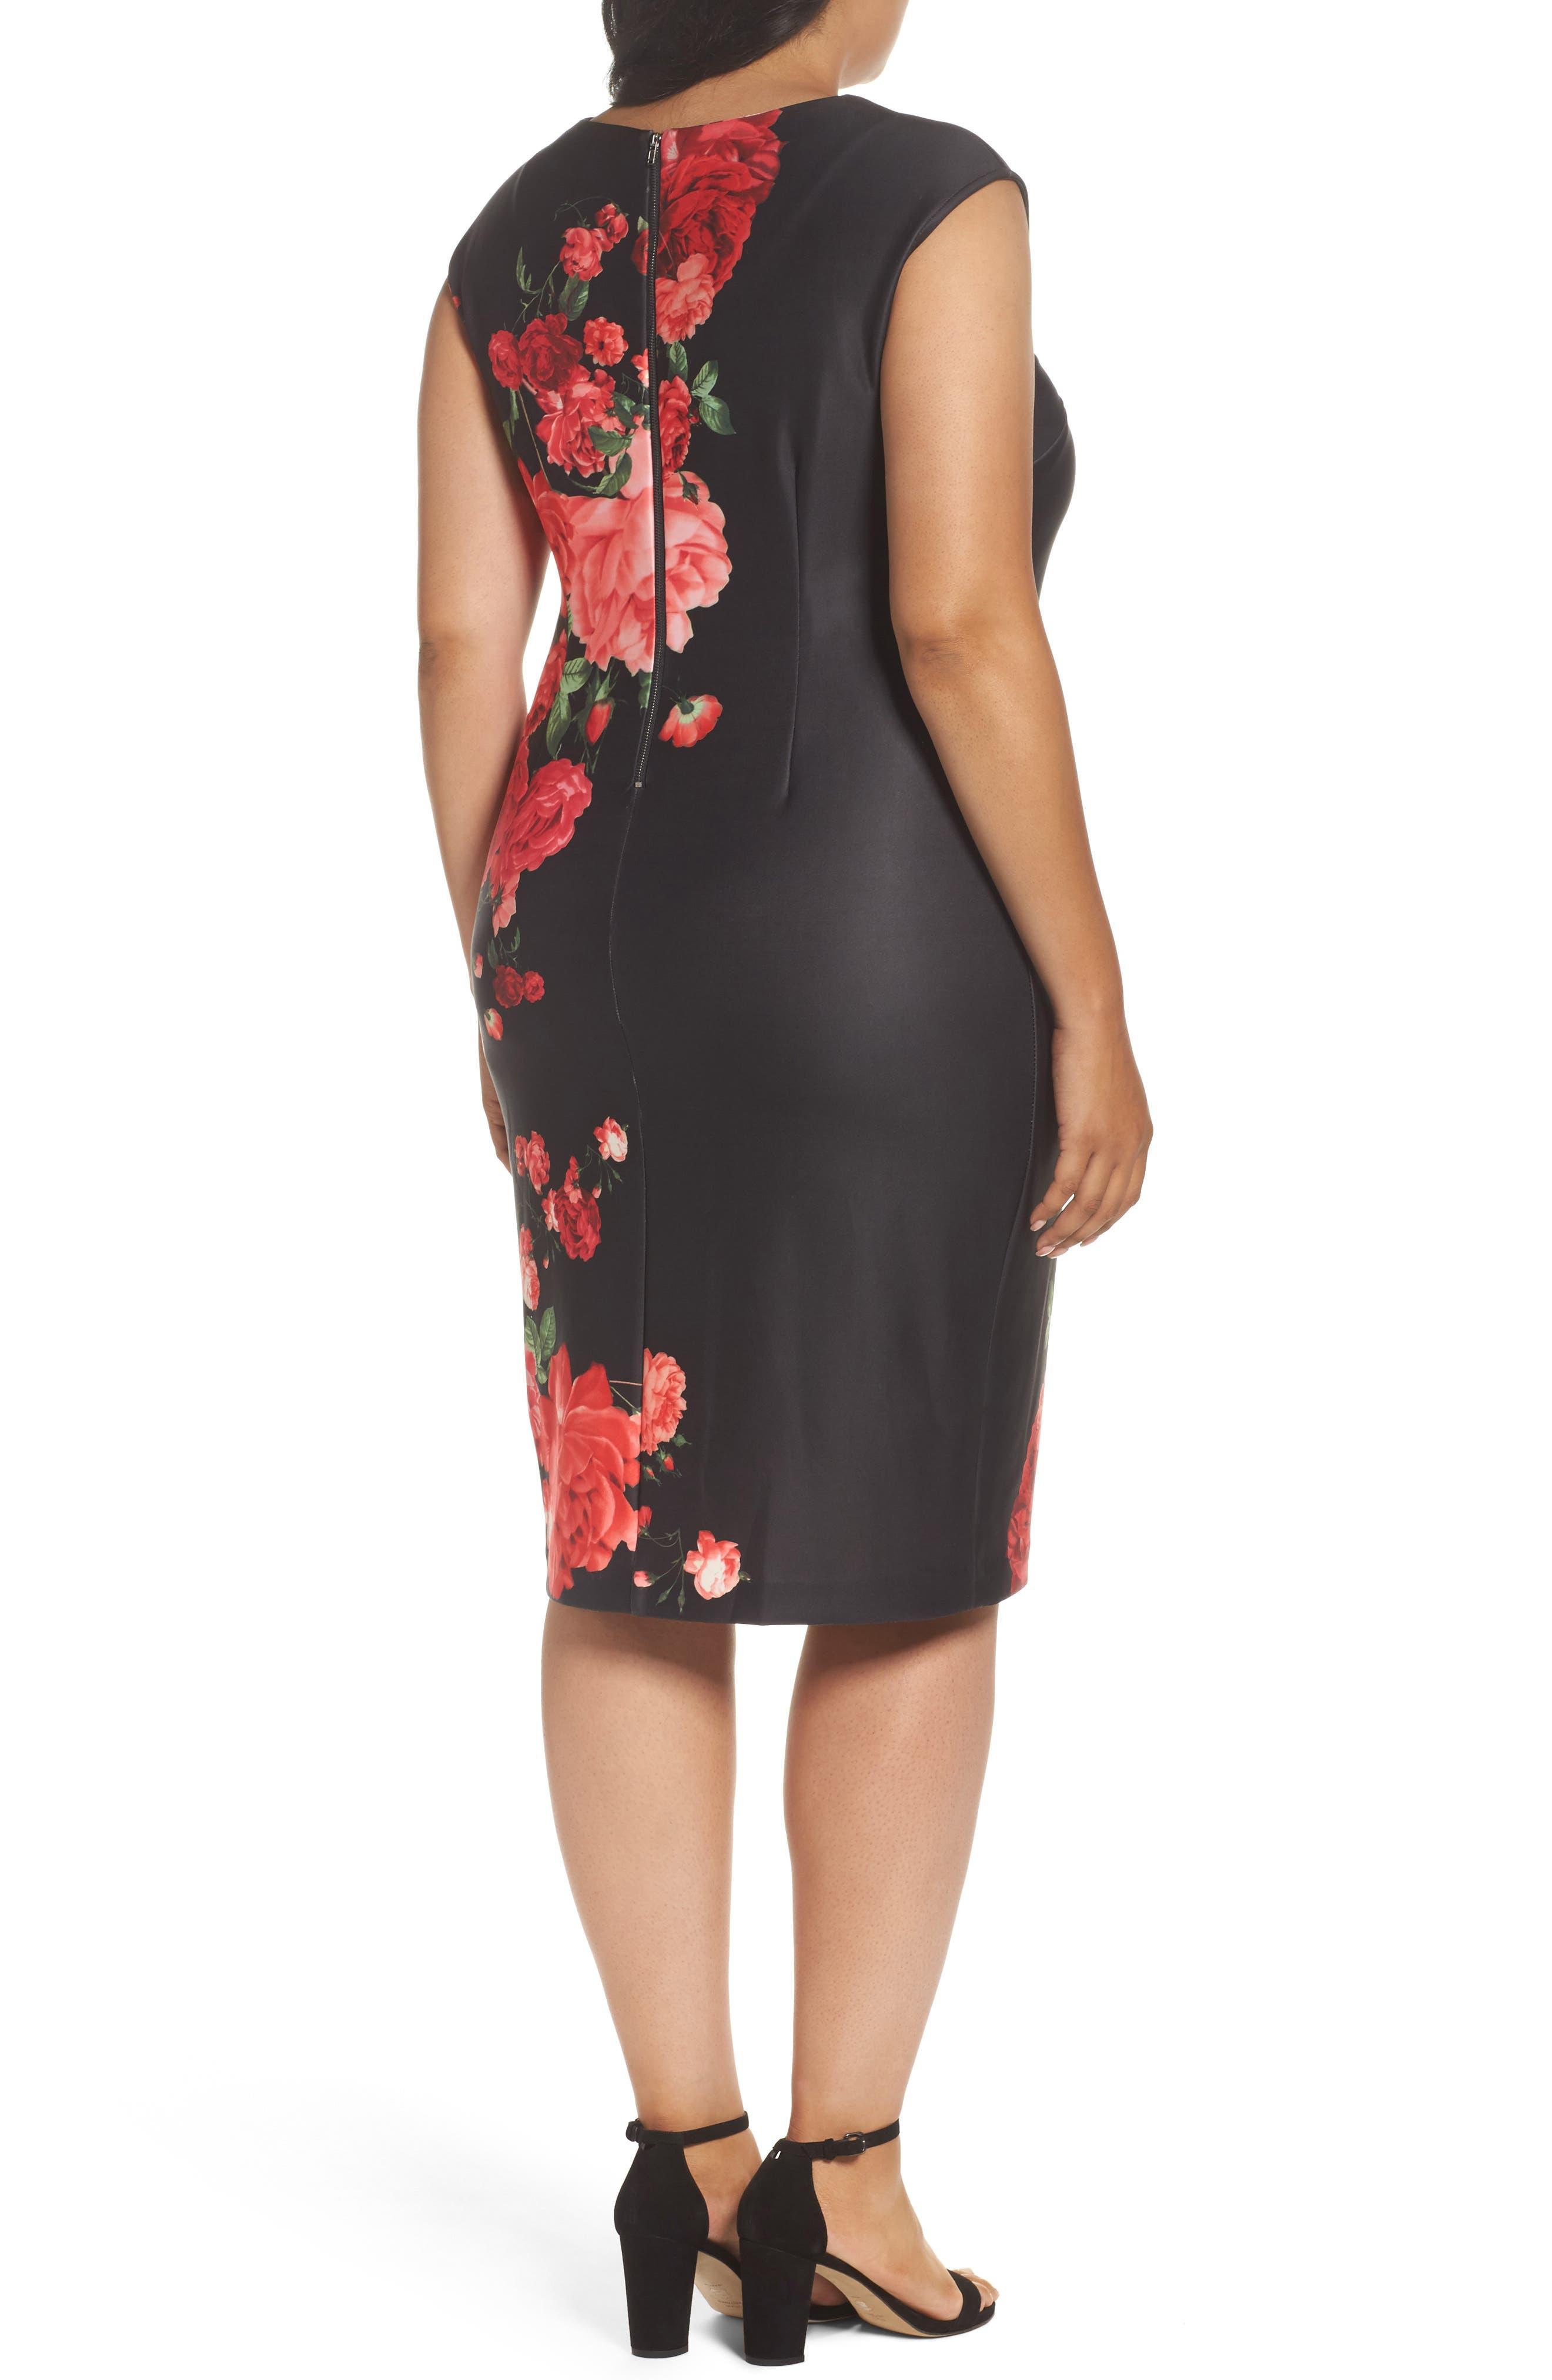 Floral Print Sheath Dress,                             Alternate thumbnail 2, color,                             Black/ Red